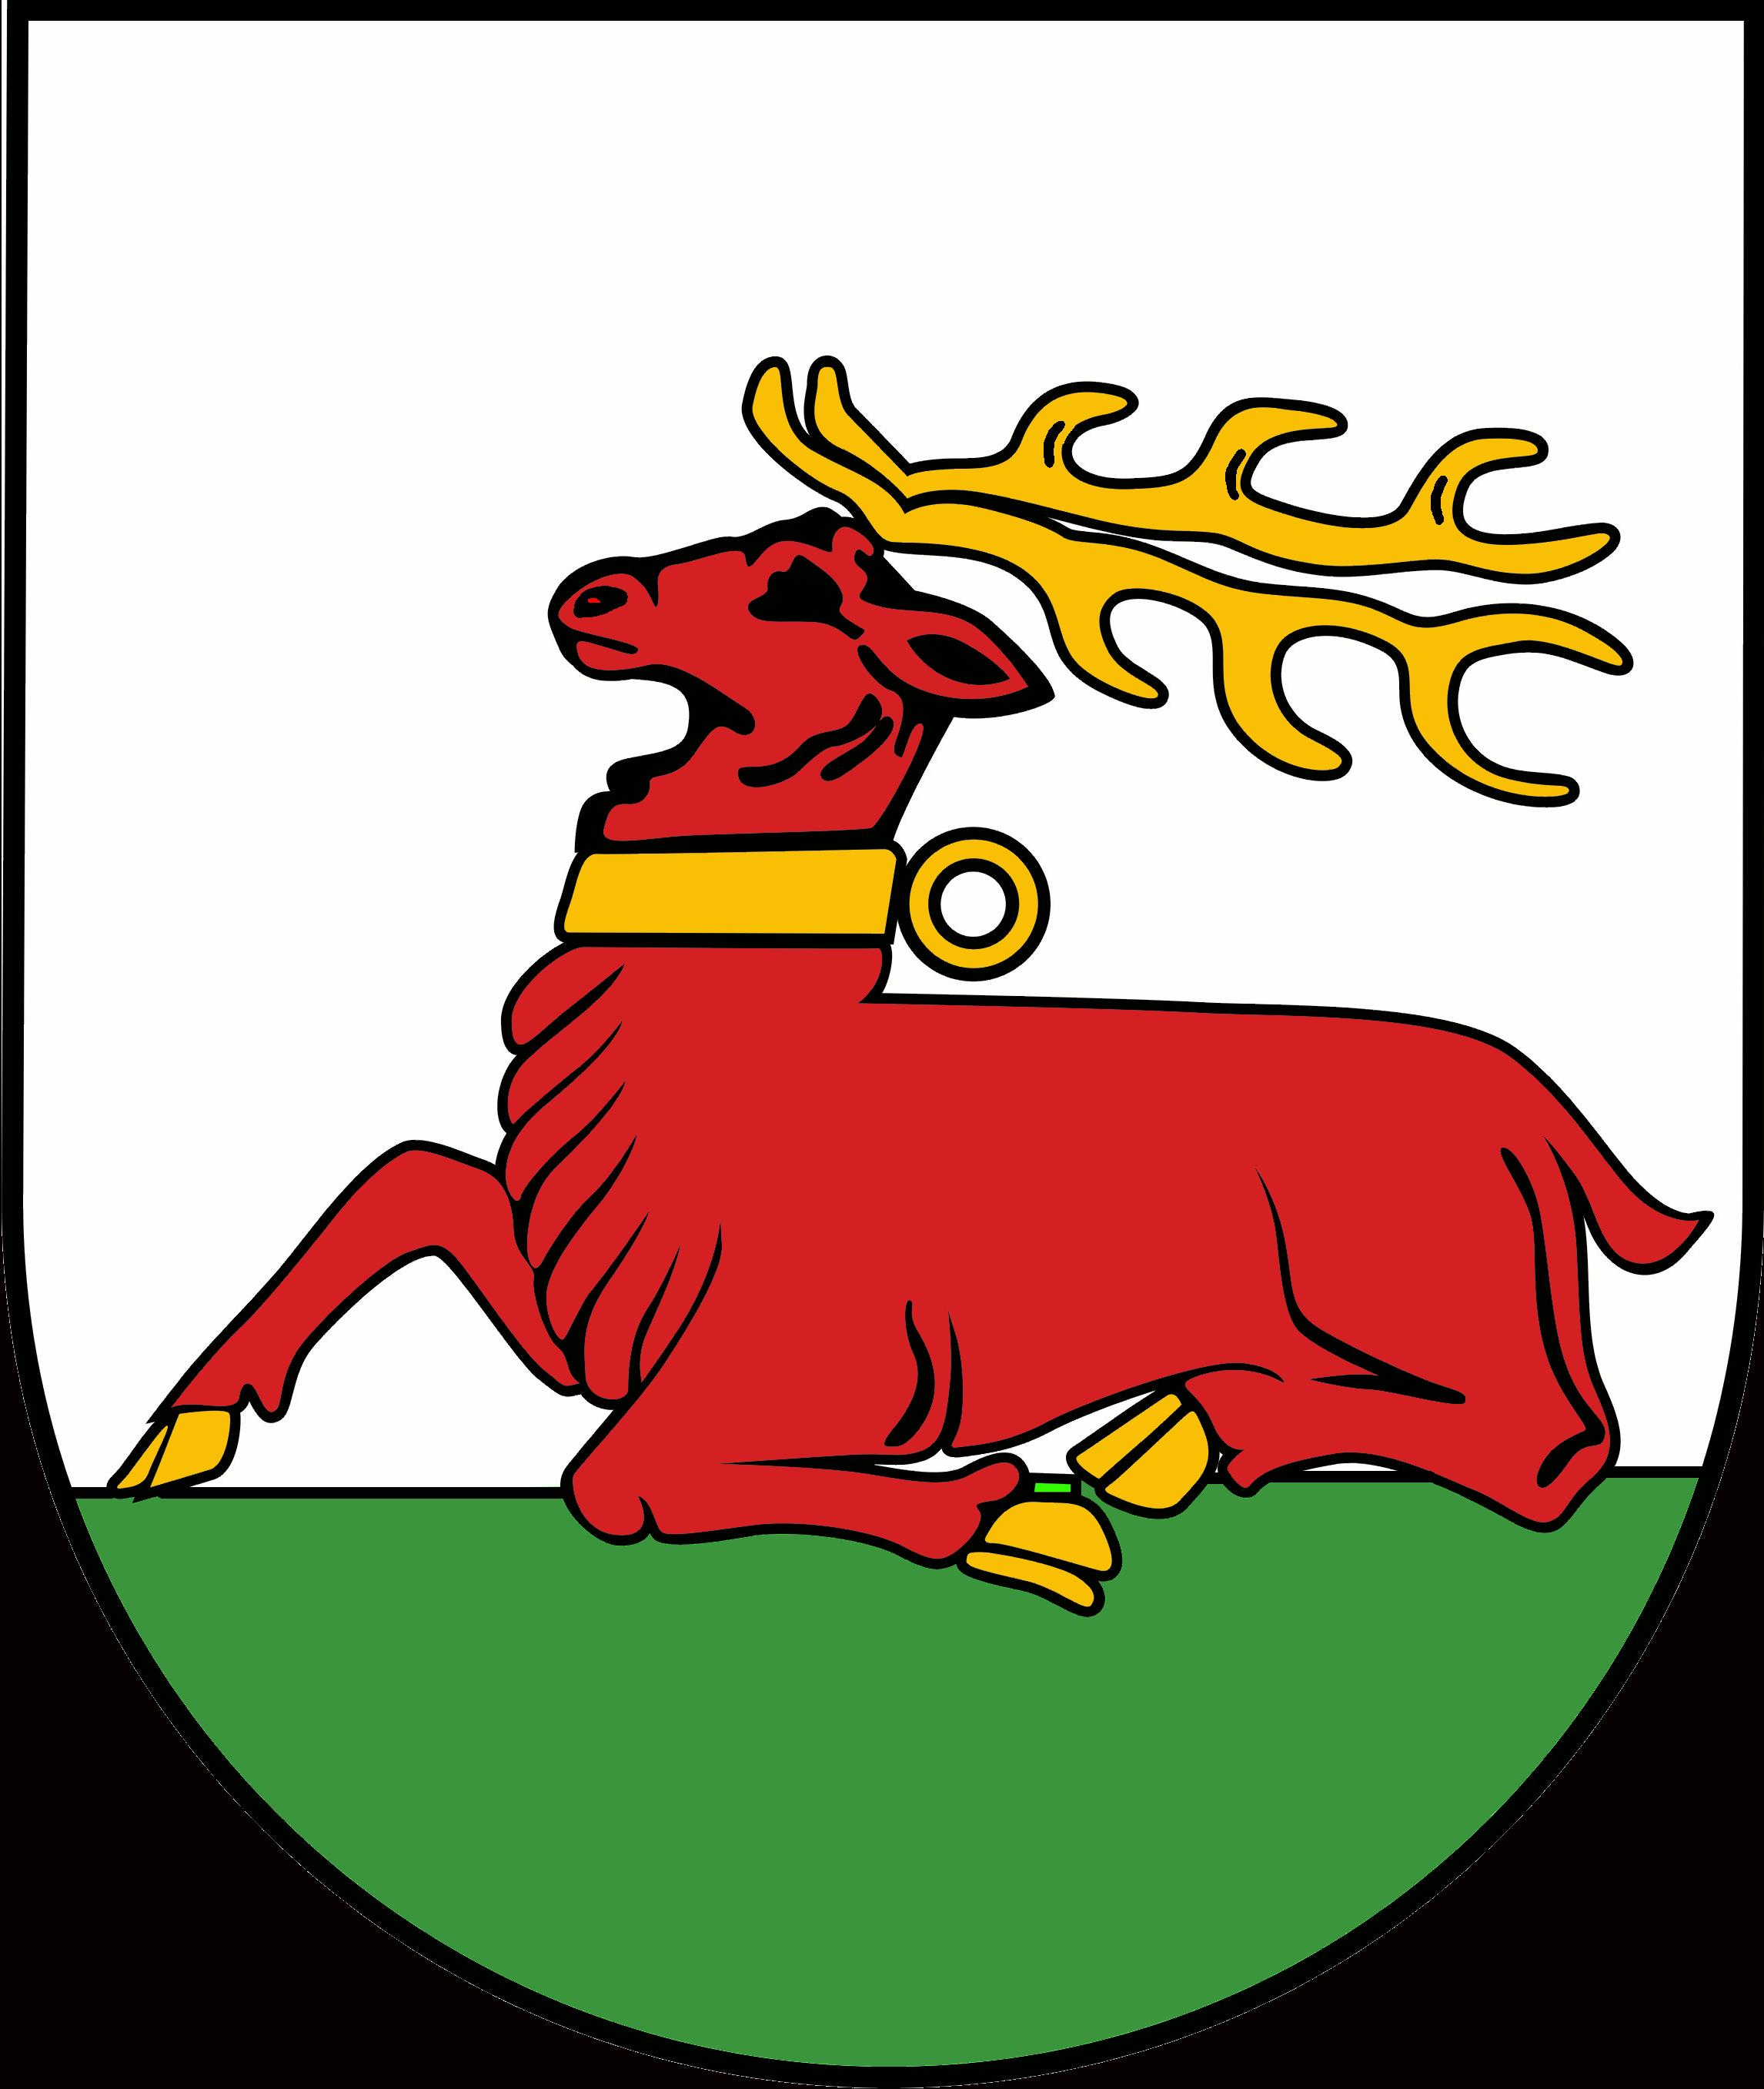 Herb gminy Wieleń.png